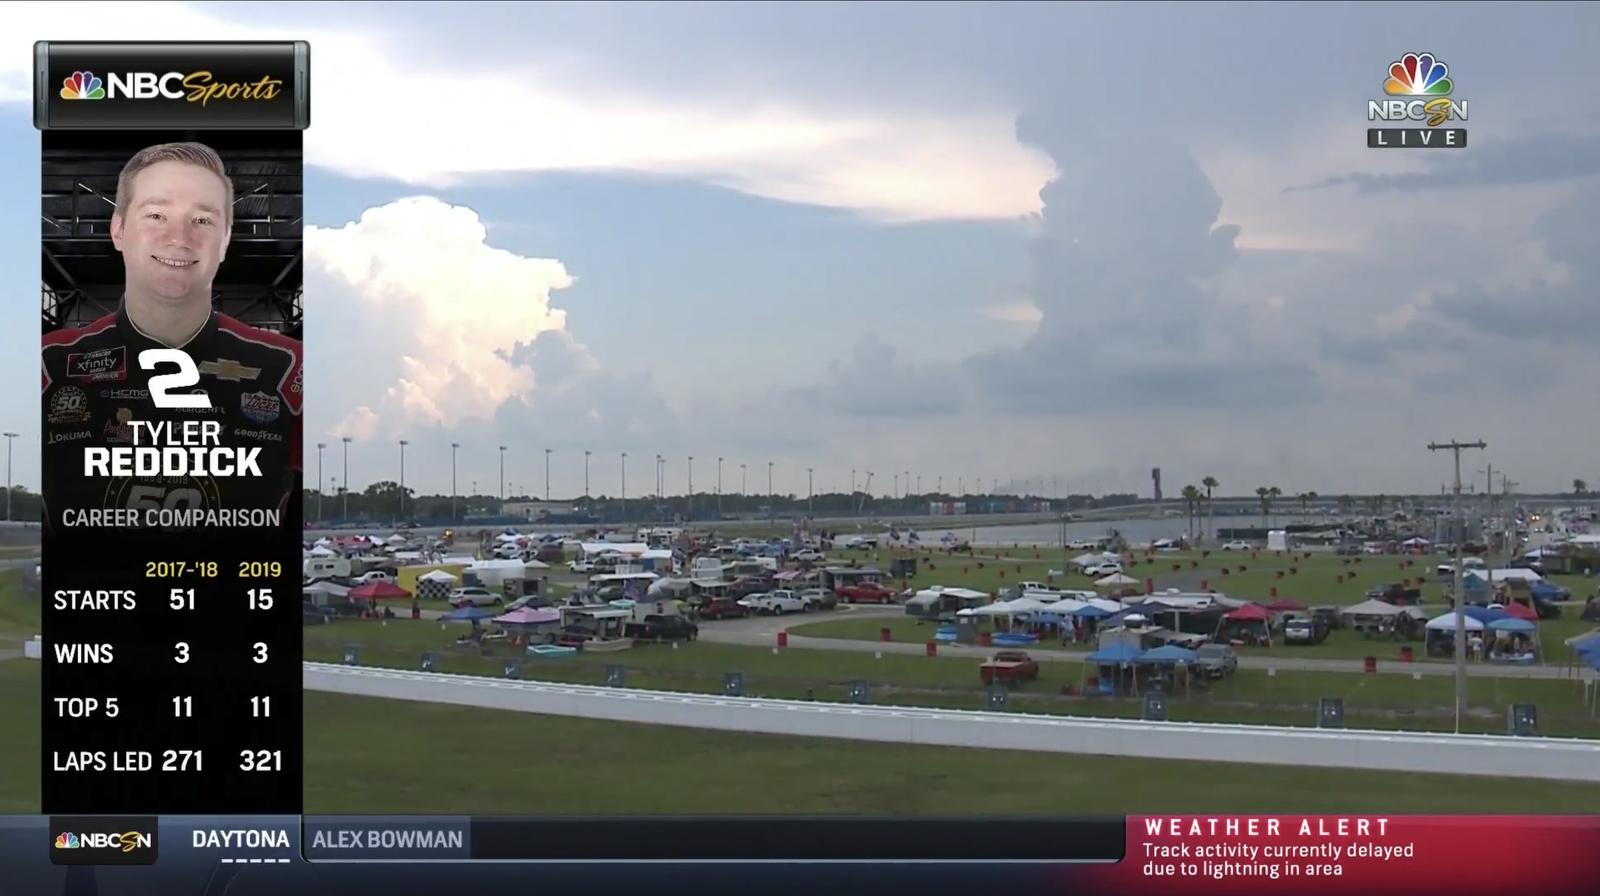 NCS_NBC-Sports_NASCAR-Design_0031